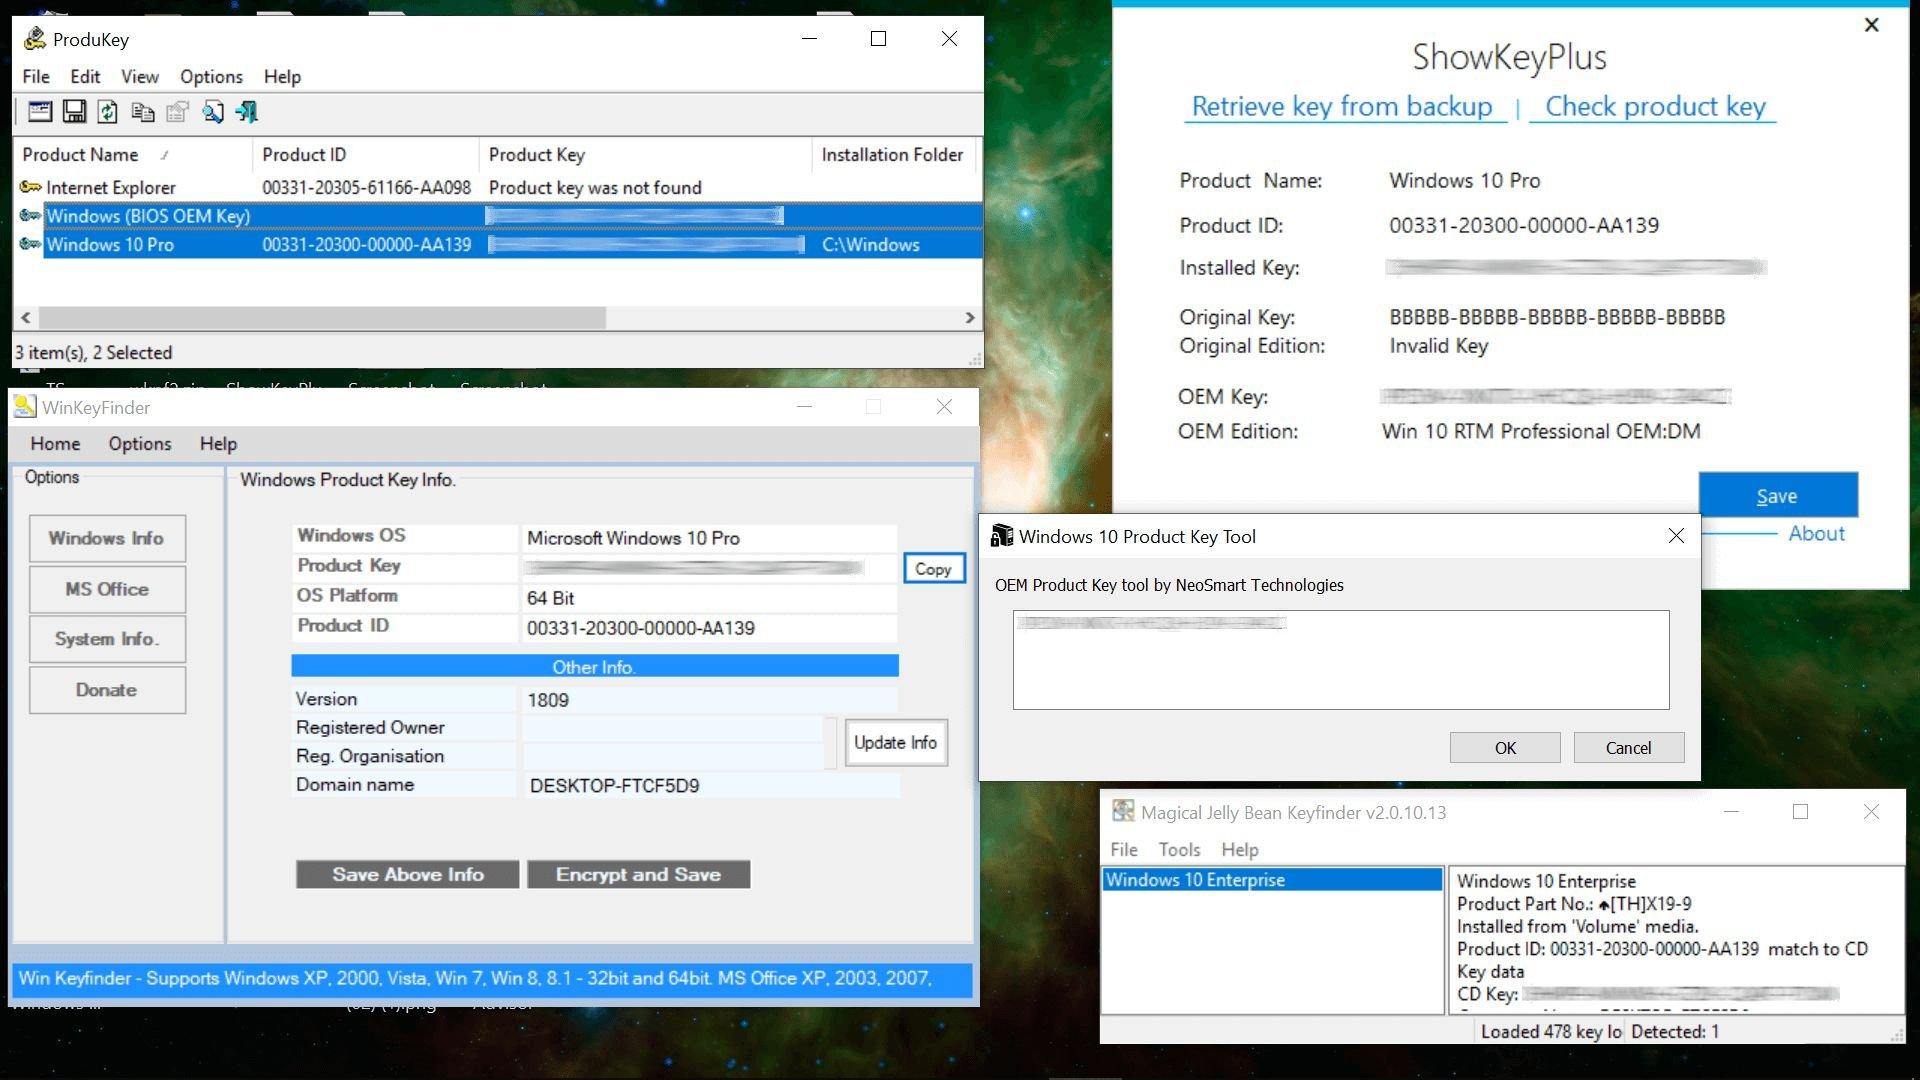 Windows Anahtarlarını Bulan Üçüncü Taraf Uygulamalar